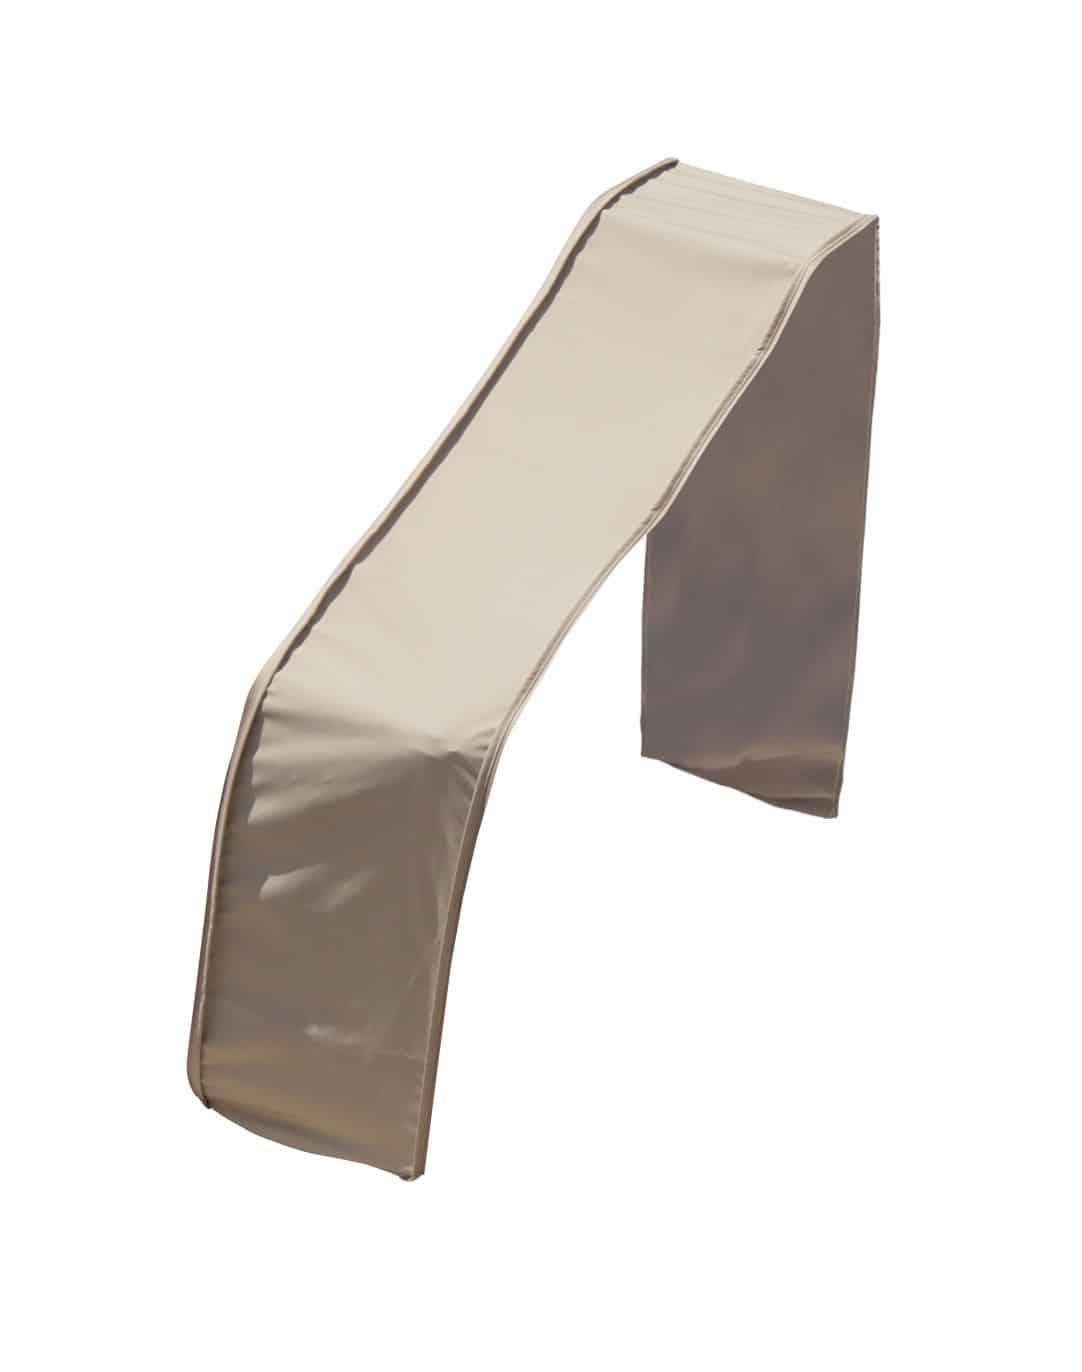 Protective Cover Modular Extension Hauser S Patio